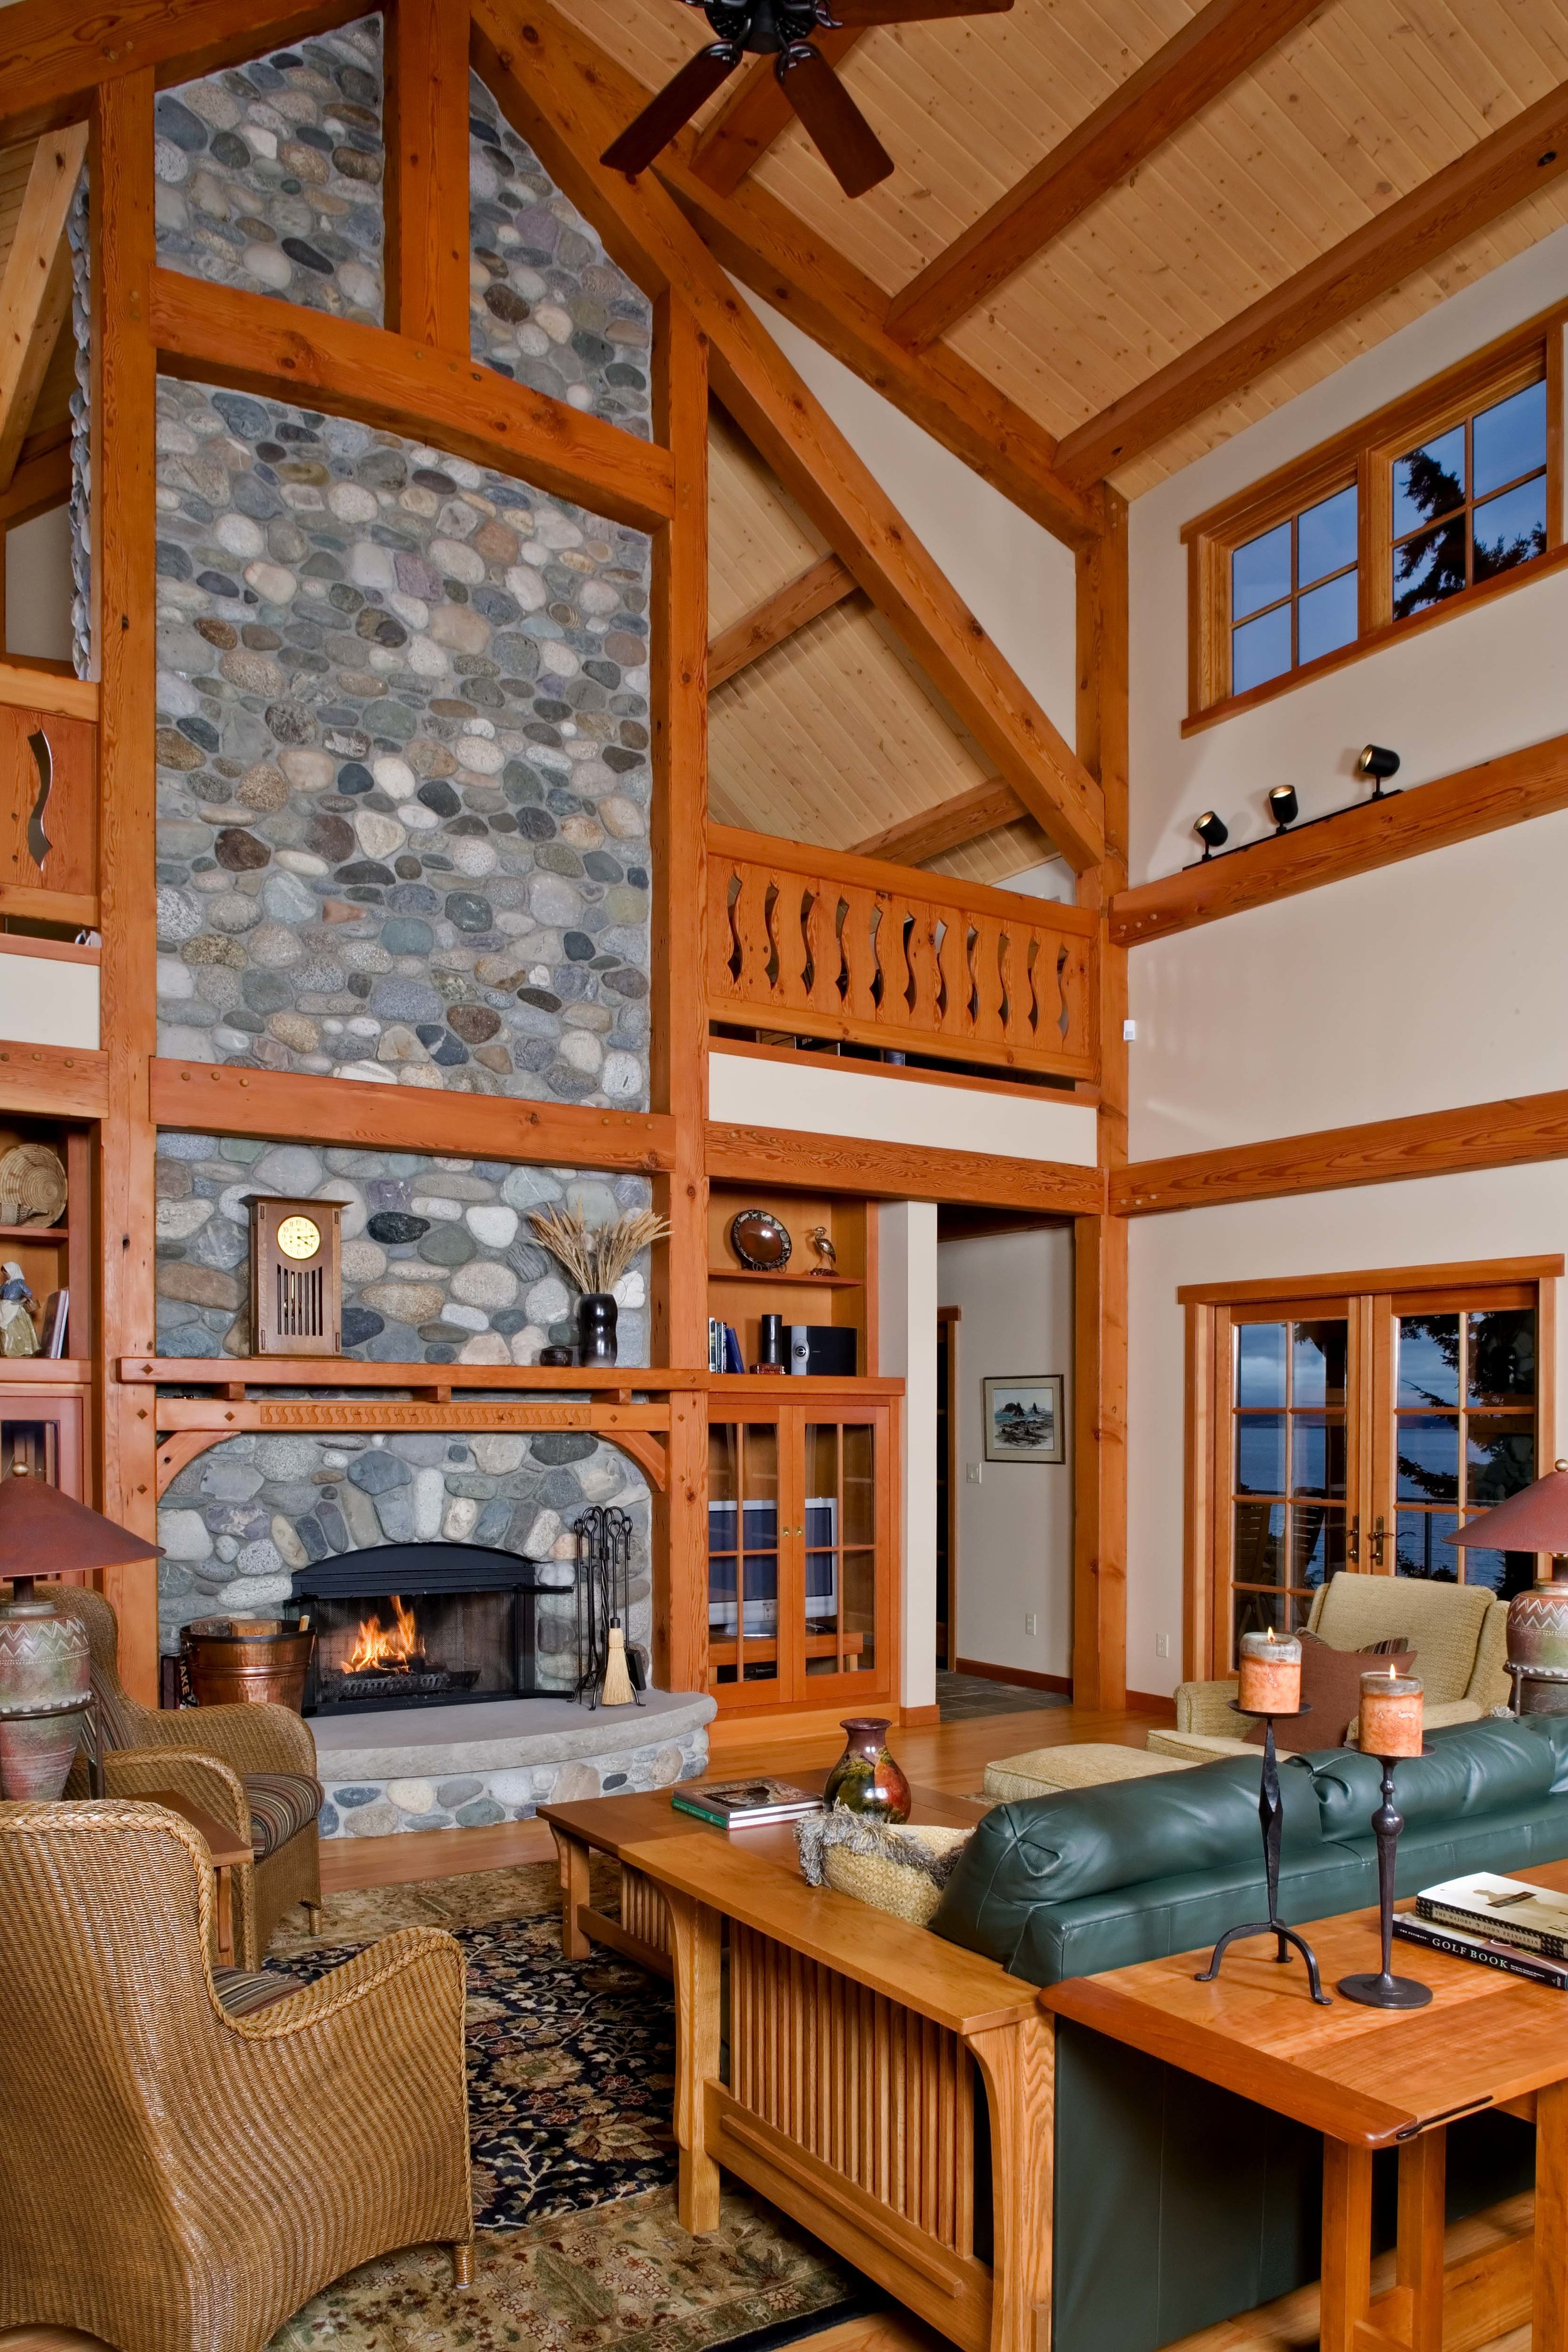 Port Ludlow Timber Frame Home - Living Room